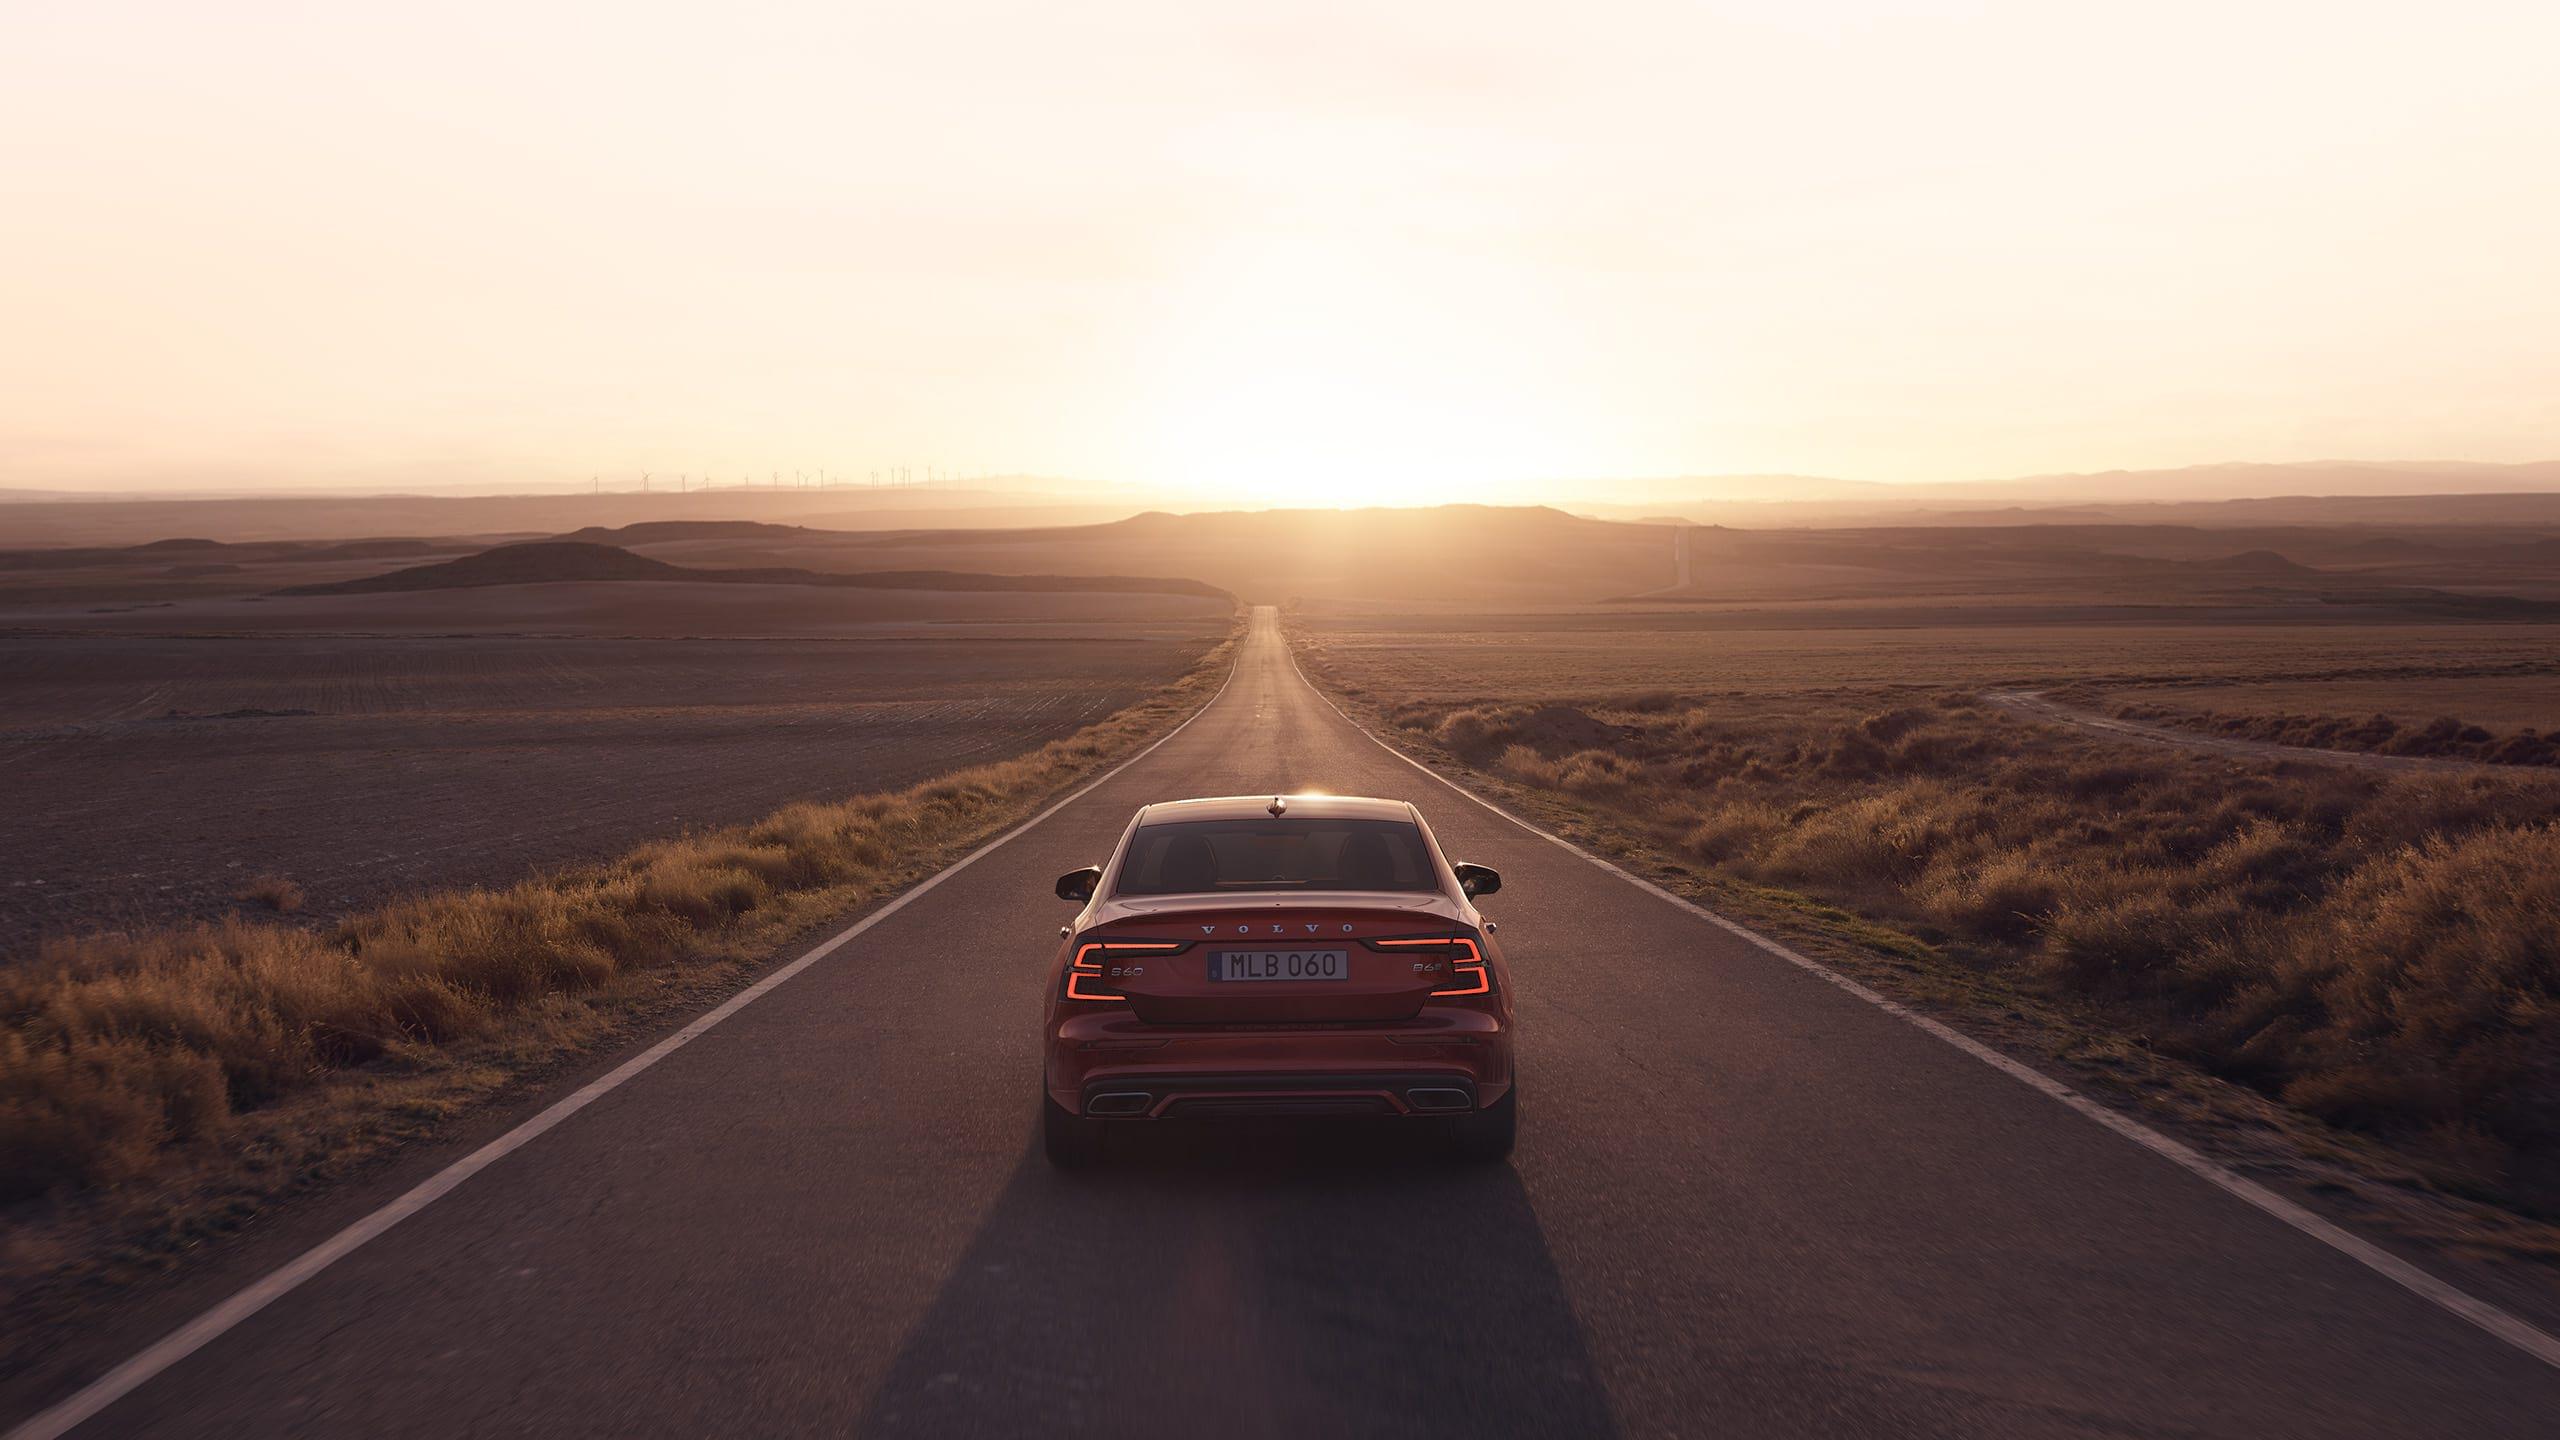 Crveni Volvo S60 u vožnji putem u sumrak.